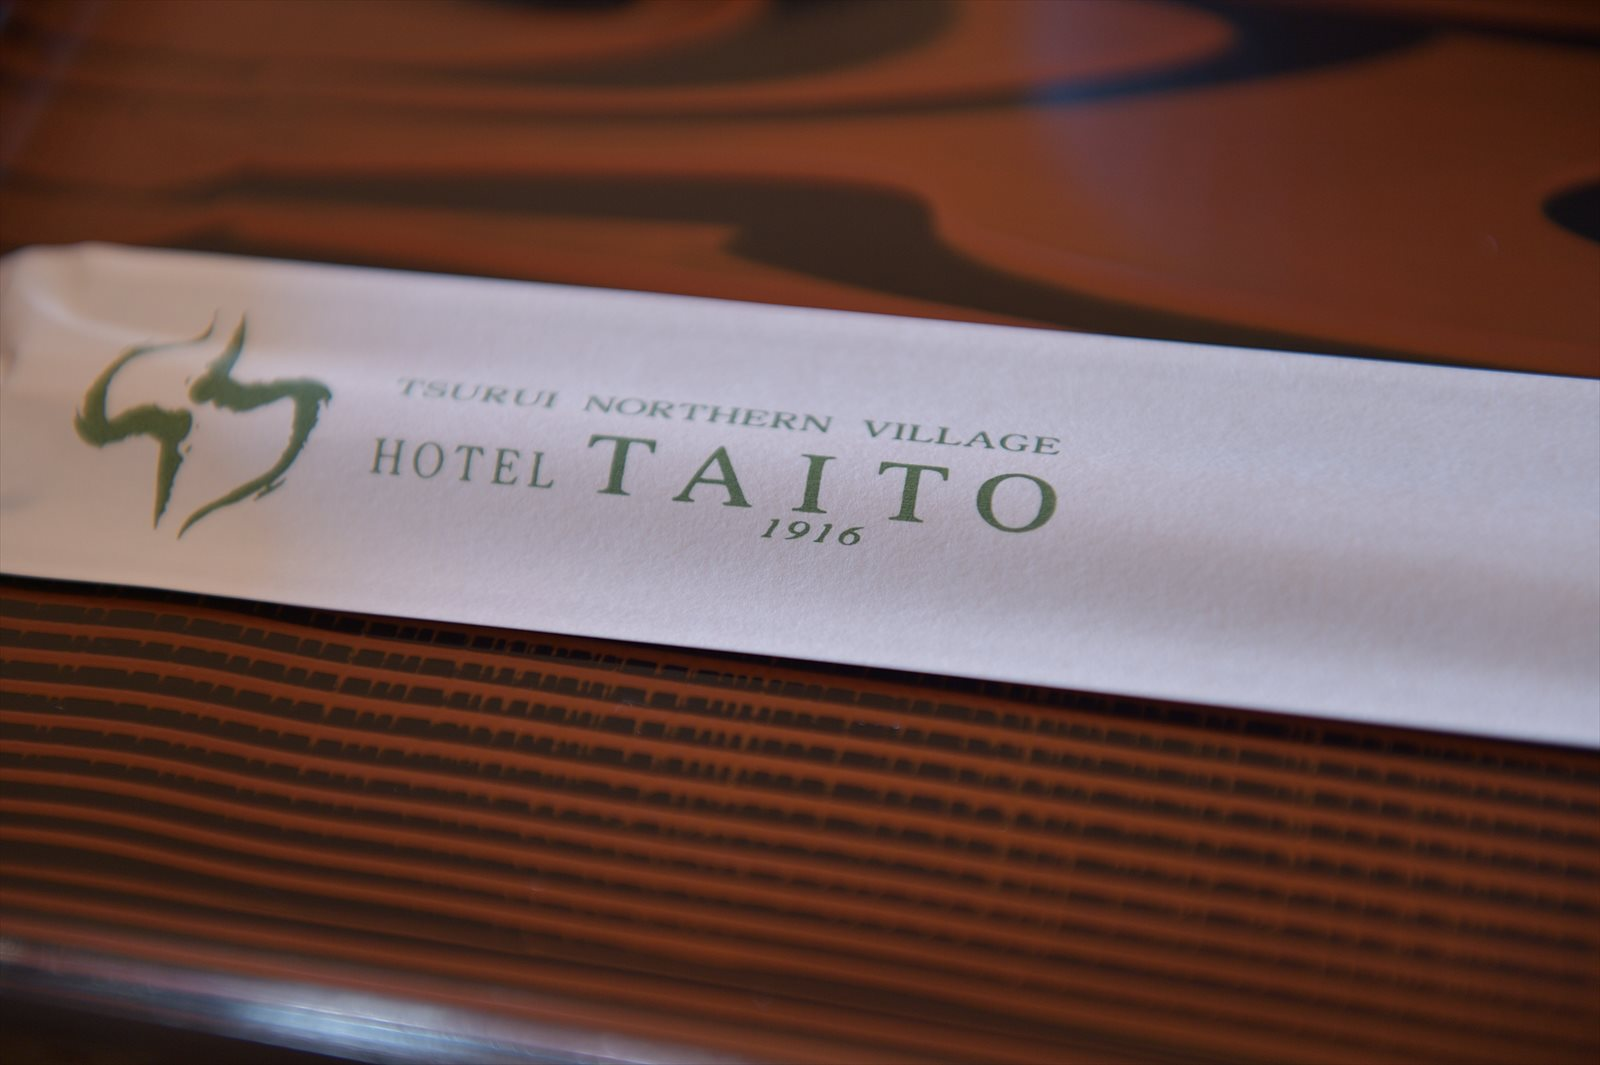 【鶴居村】HOTEL TAITO_a0145819_21164150.jpg